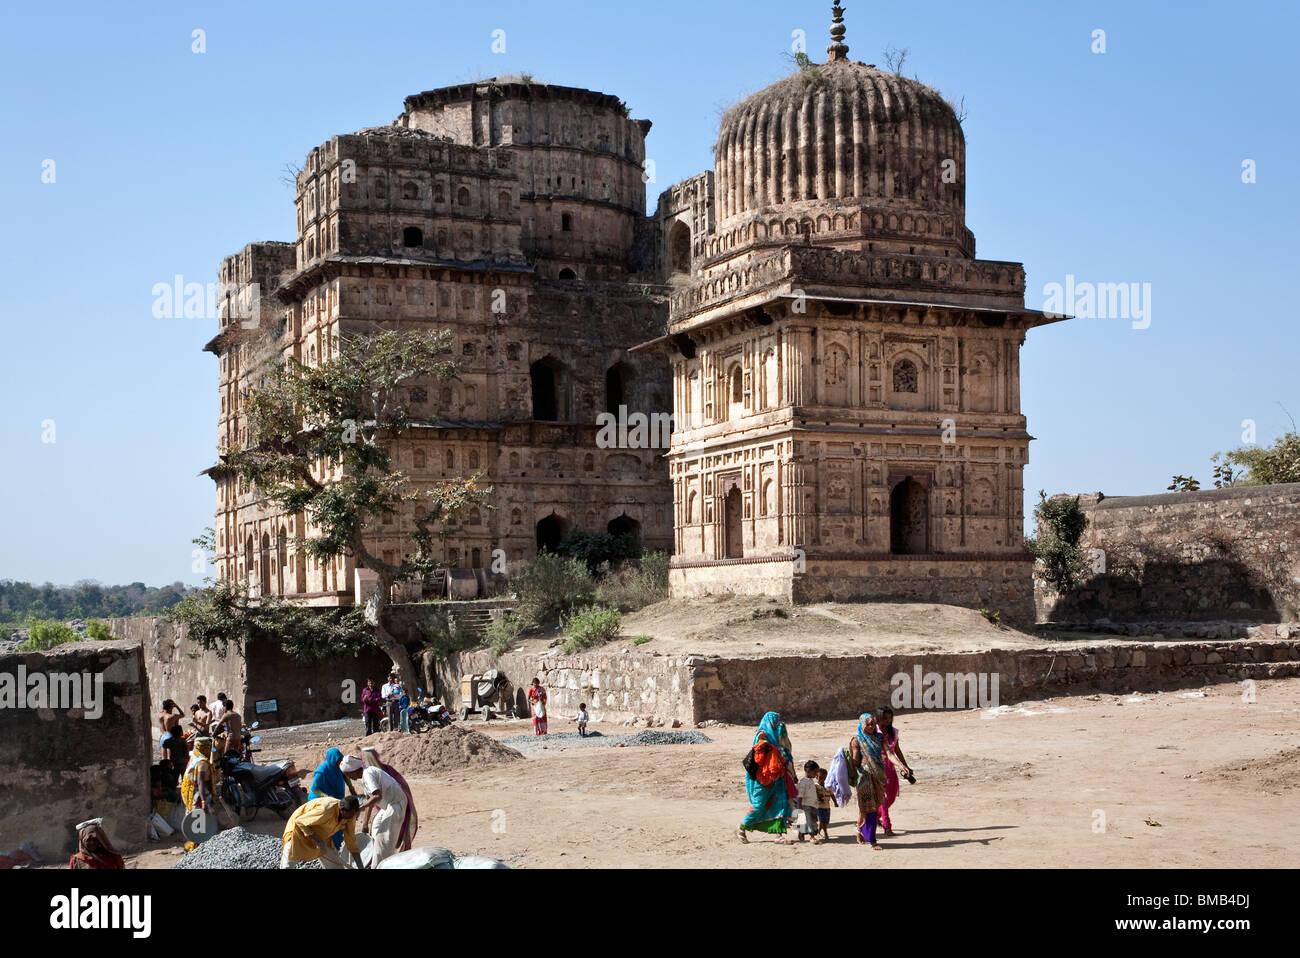 Royal cenotaphs. Orchha. India - Stock Image